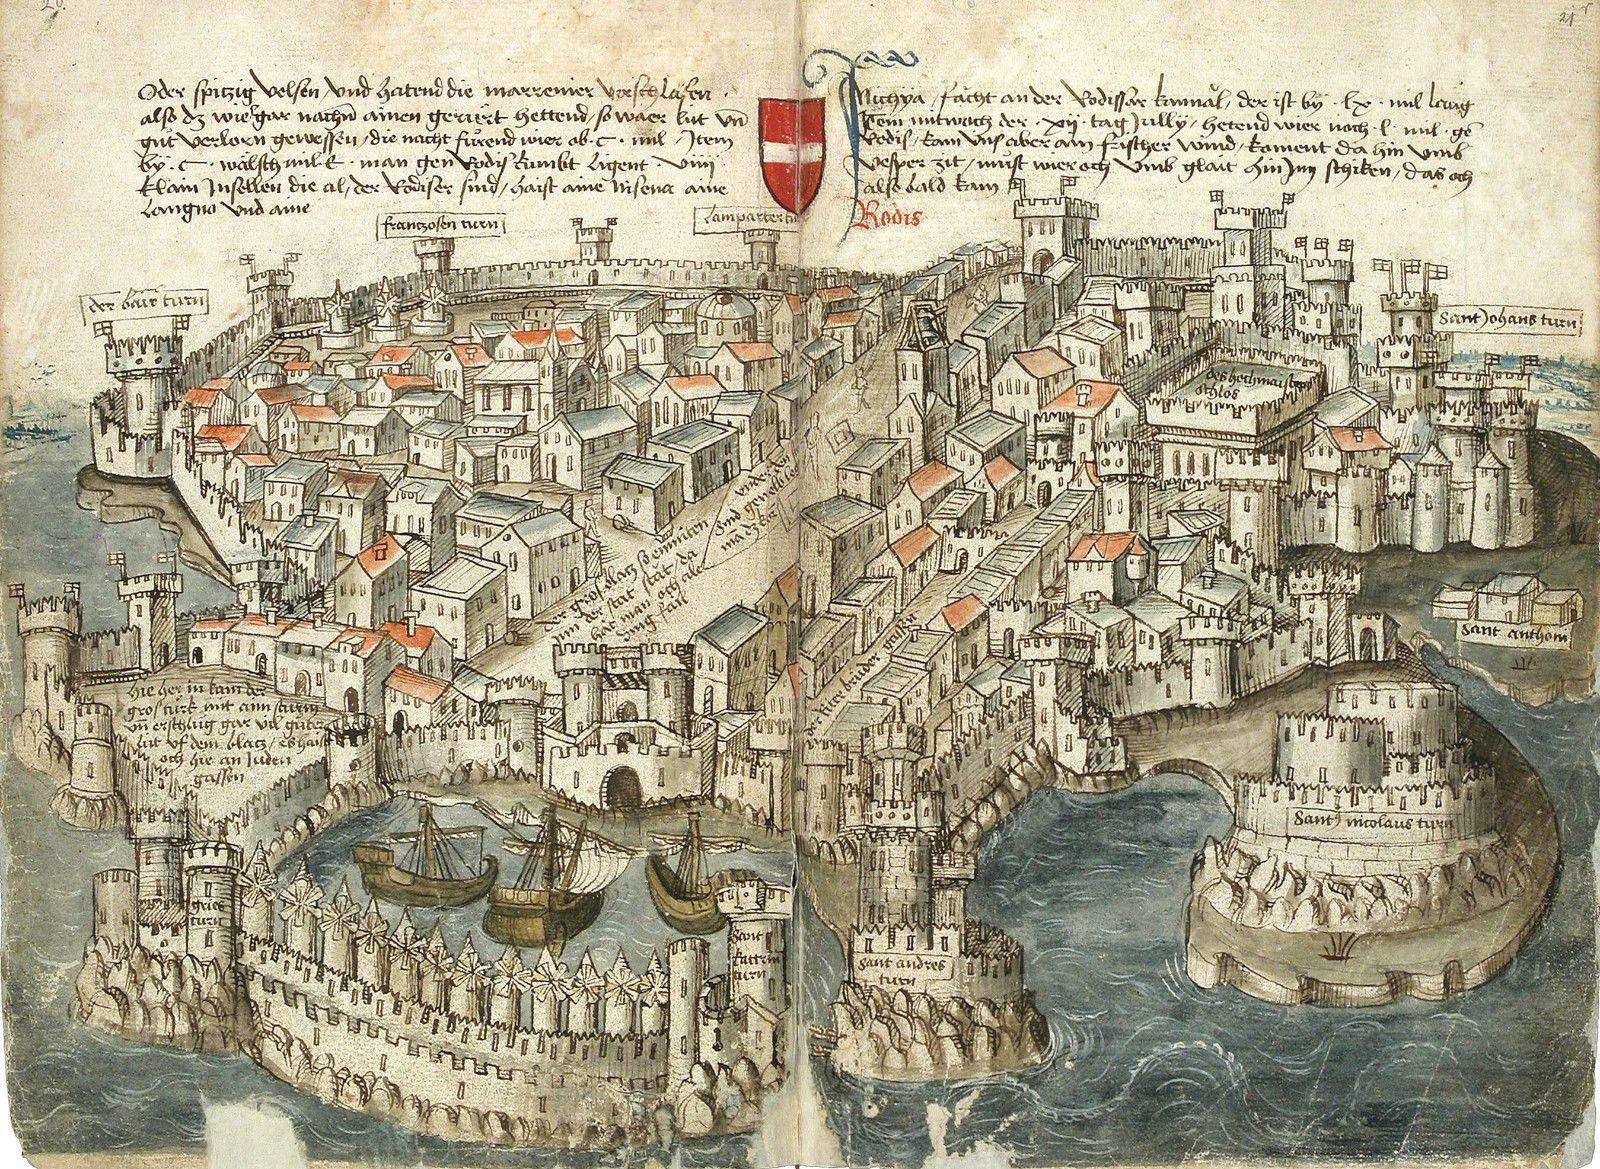 https://www.dhresource.com/0x0/f2/albu/g10/M00/75/25/rBVaWVwfYvaASxnuAAvasWtXdBU376.jpg/medieval-port-city-of-rhodes-greece-around.jpg